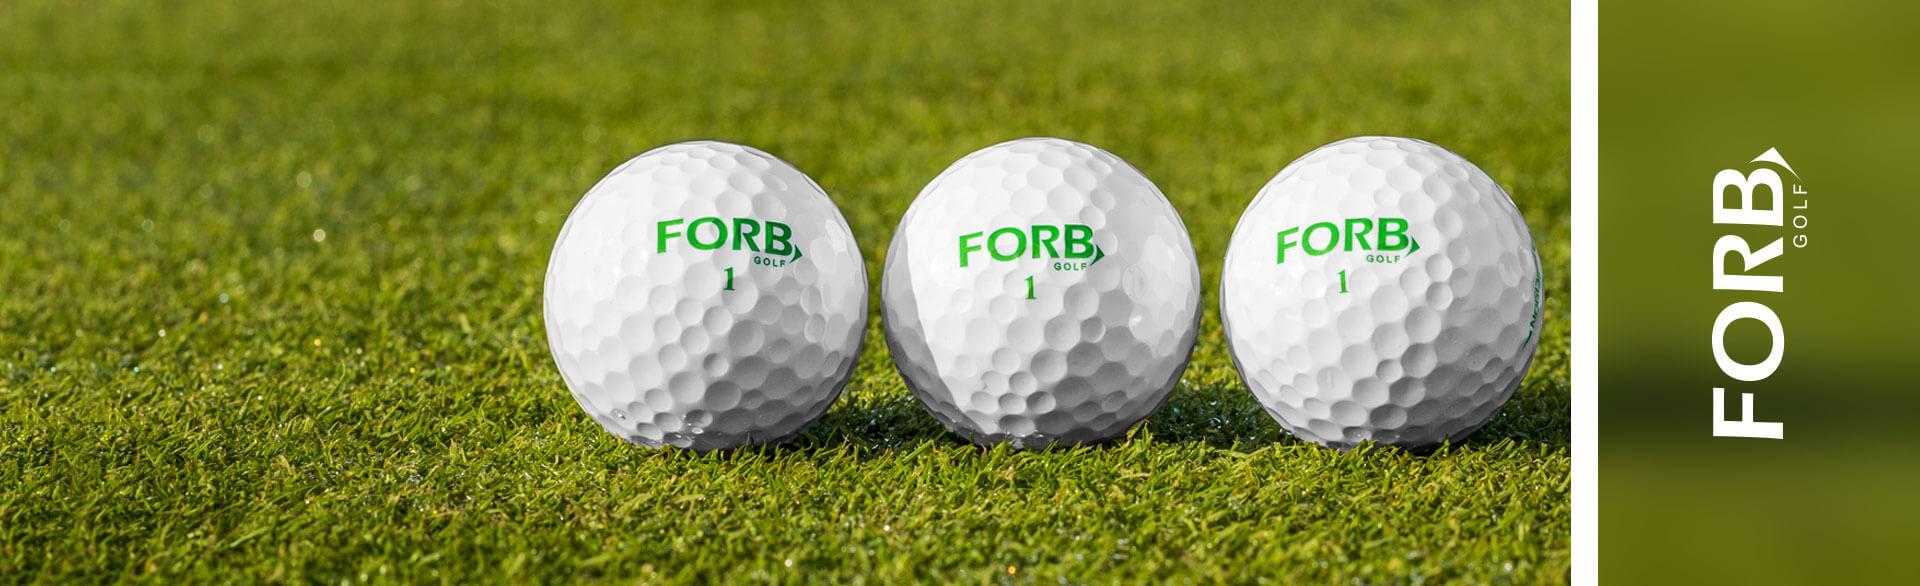 Precision Golf Balls